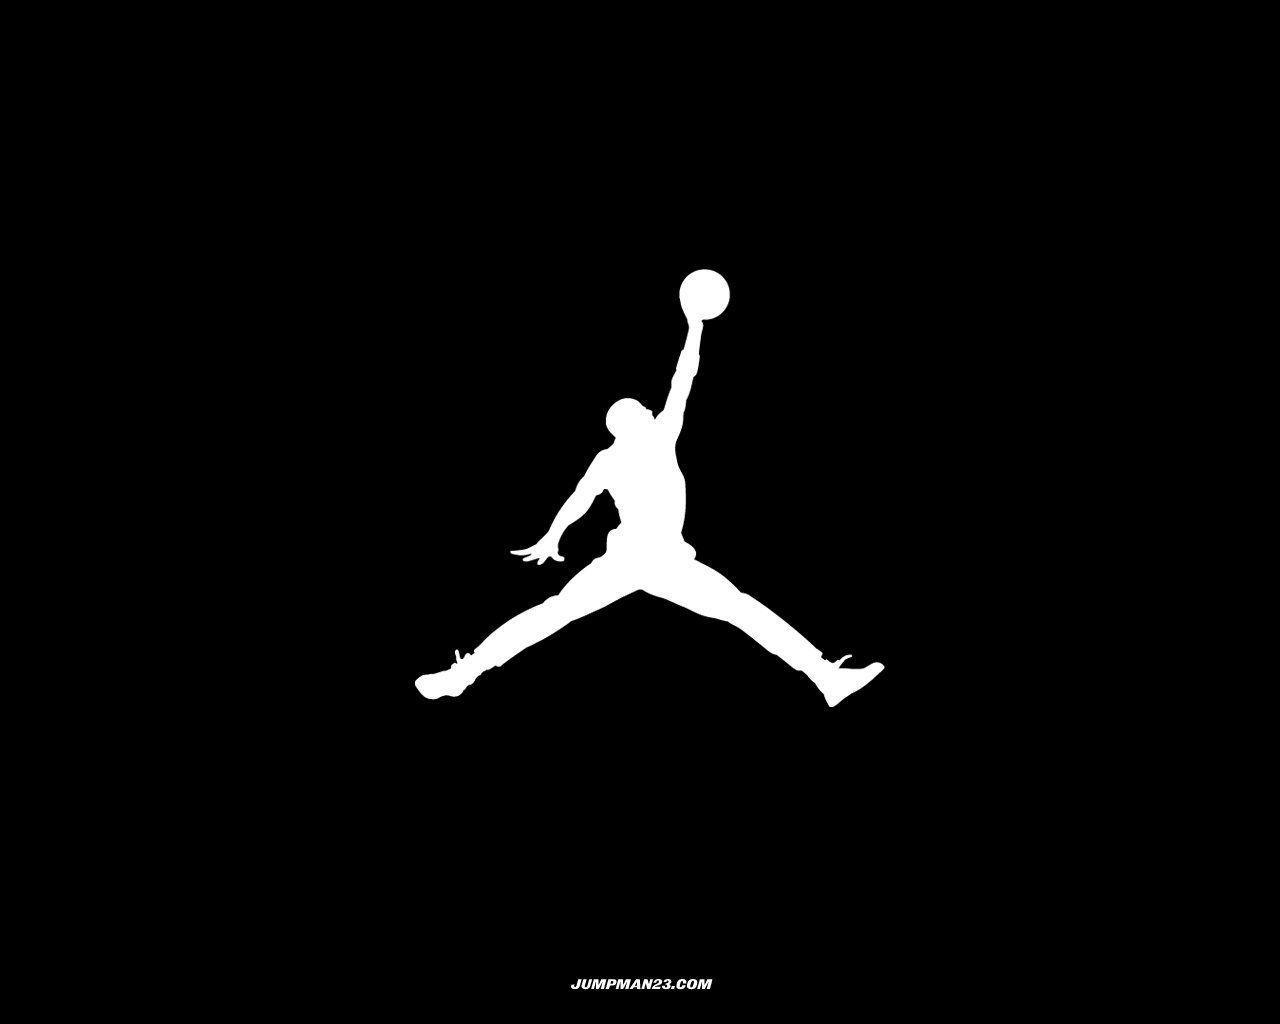 Hd michael jordan wallpapers wallpaper cave - Jordan jumpman logo wallpaper ...